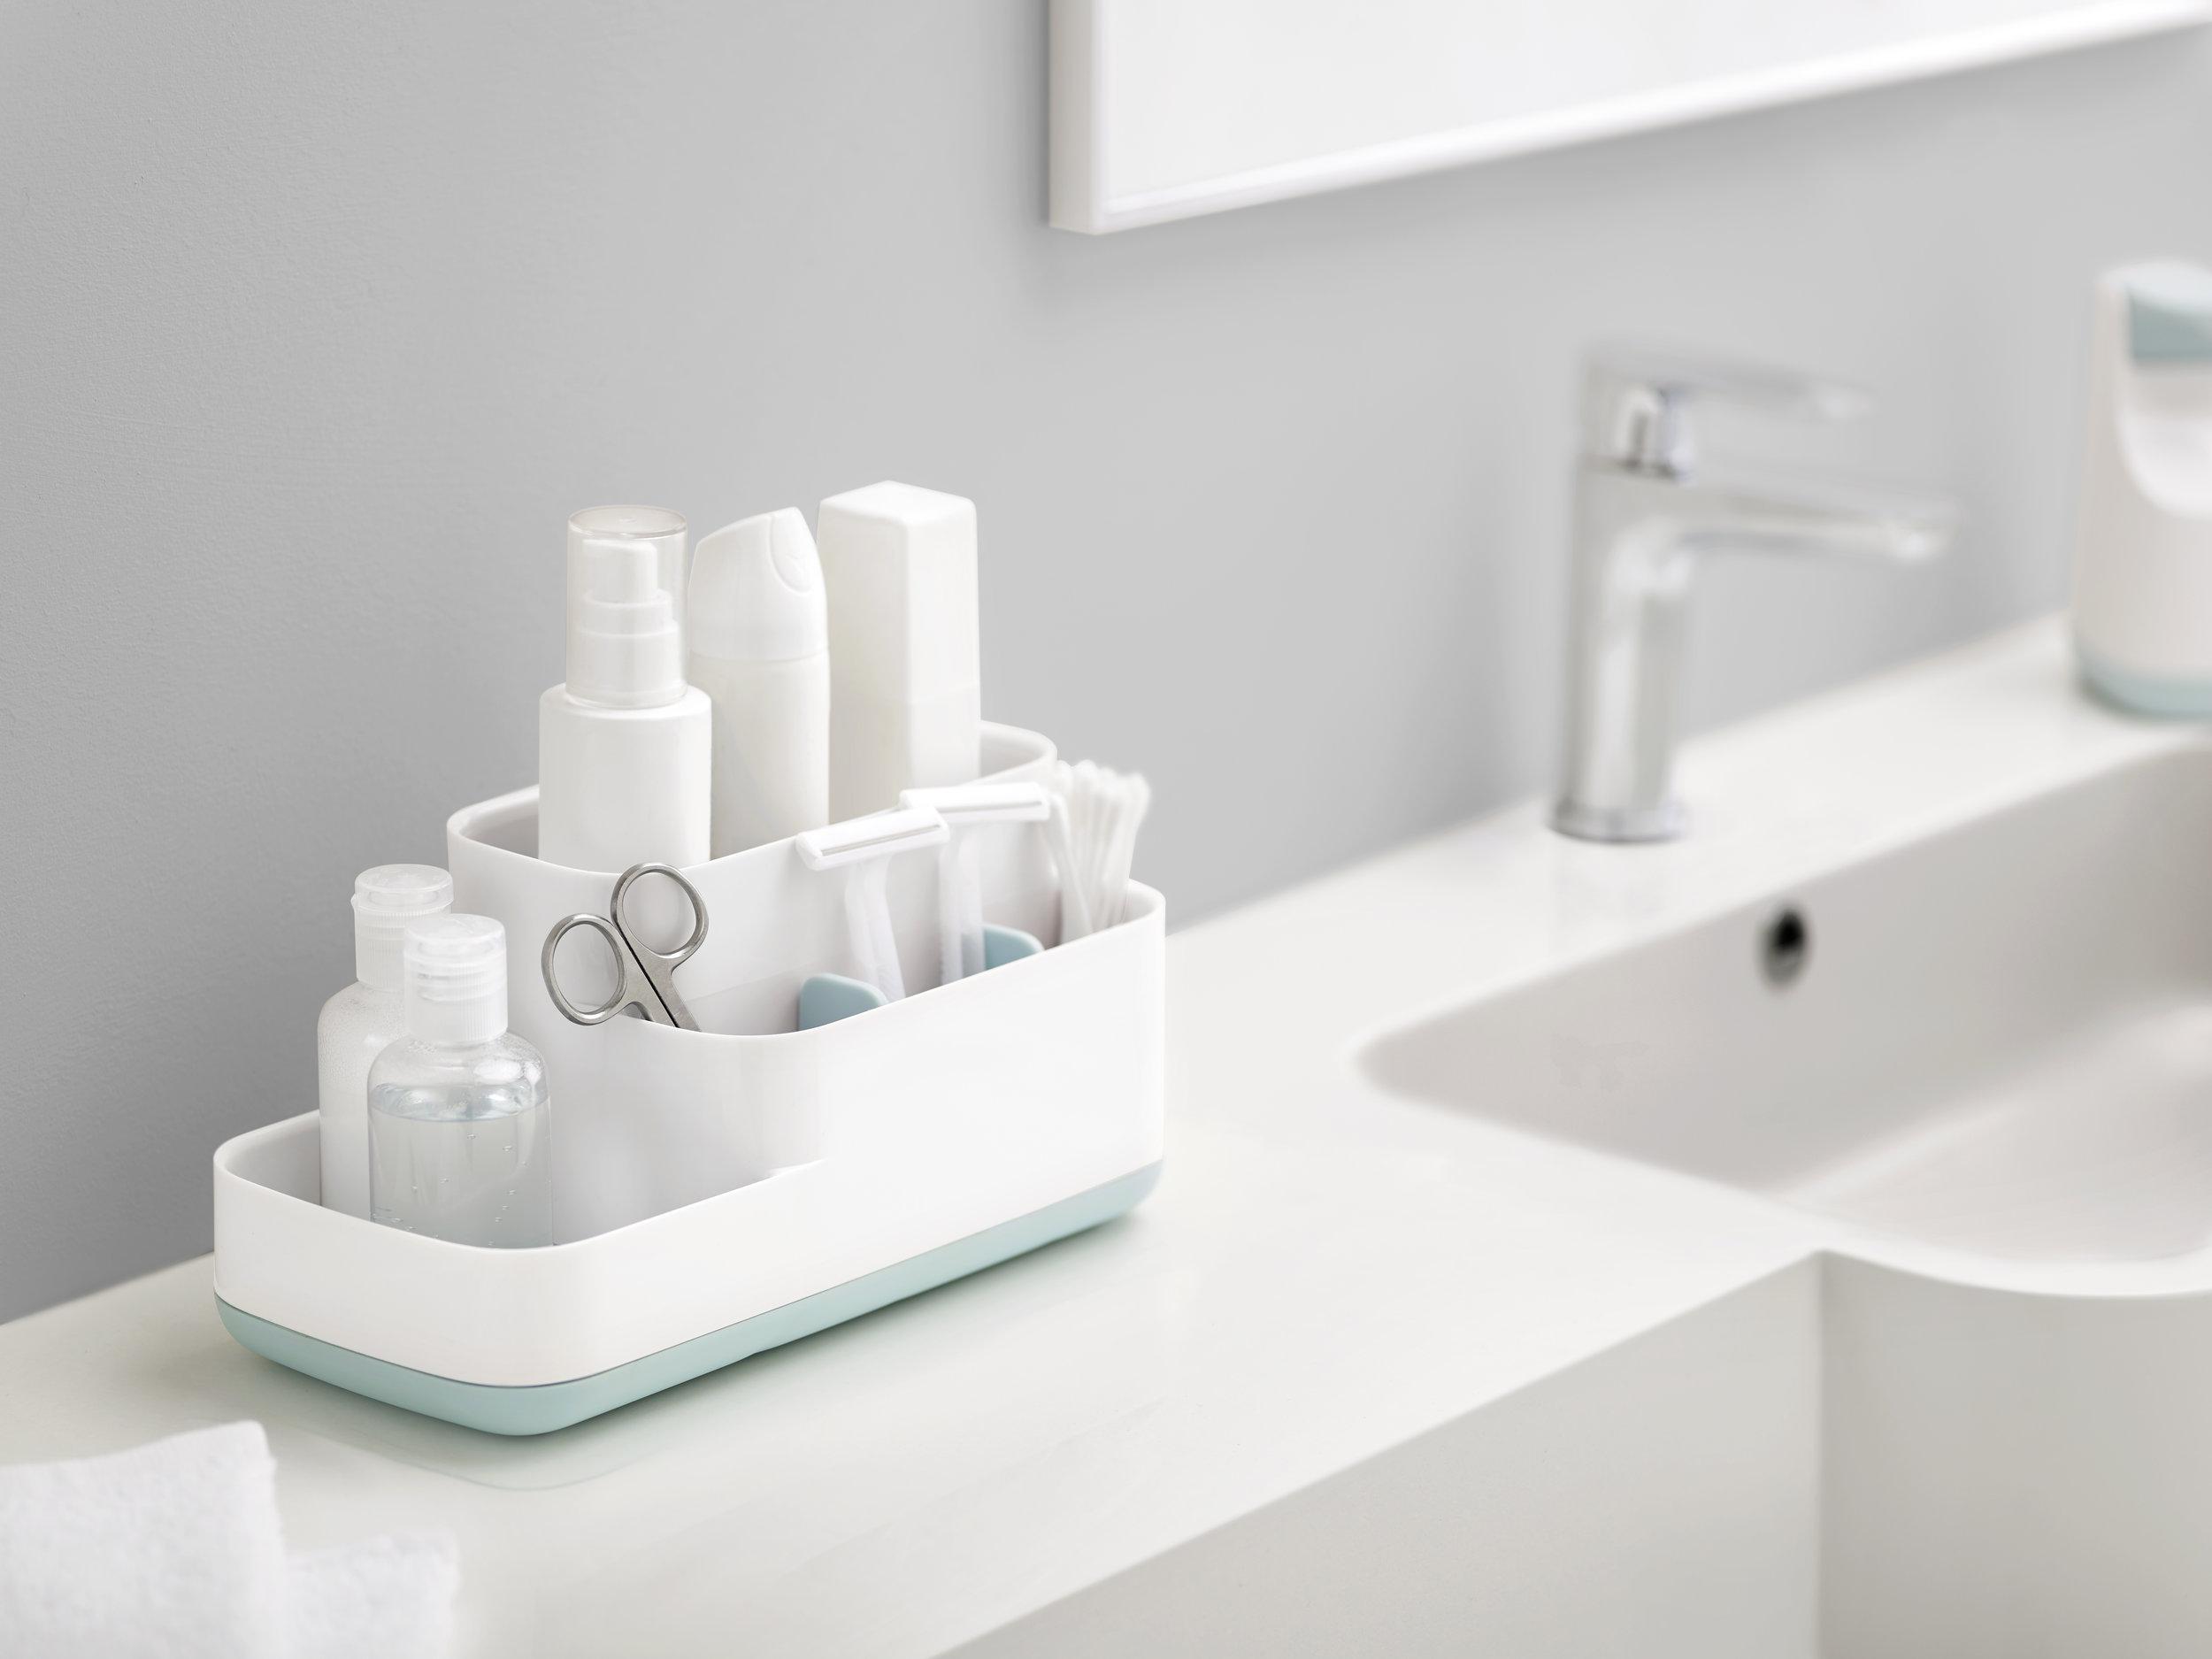 Studio Wood - JJ Bathroom Caddy Product Design 03